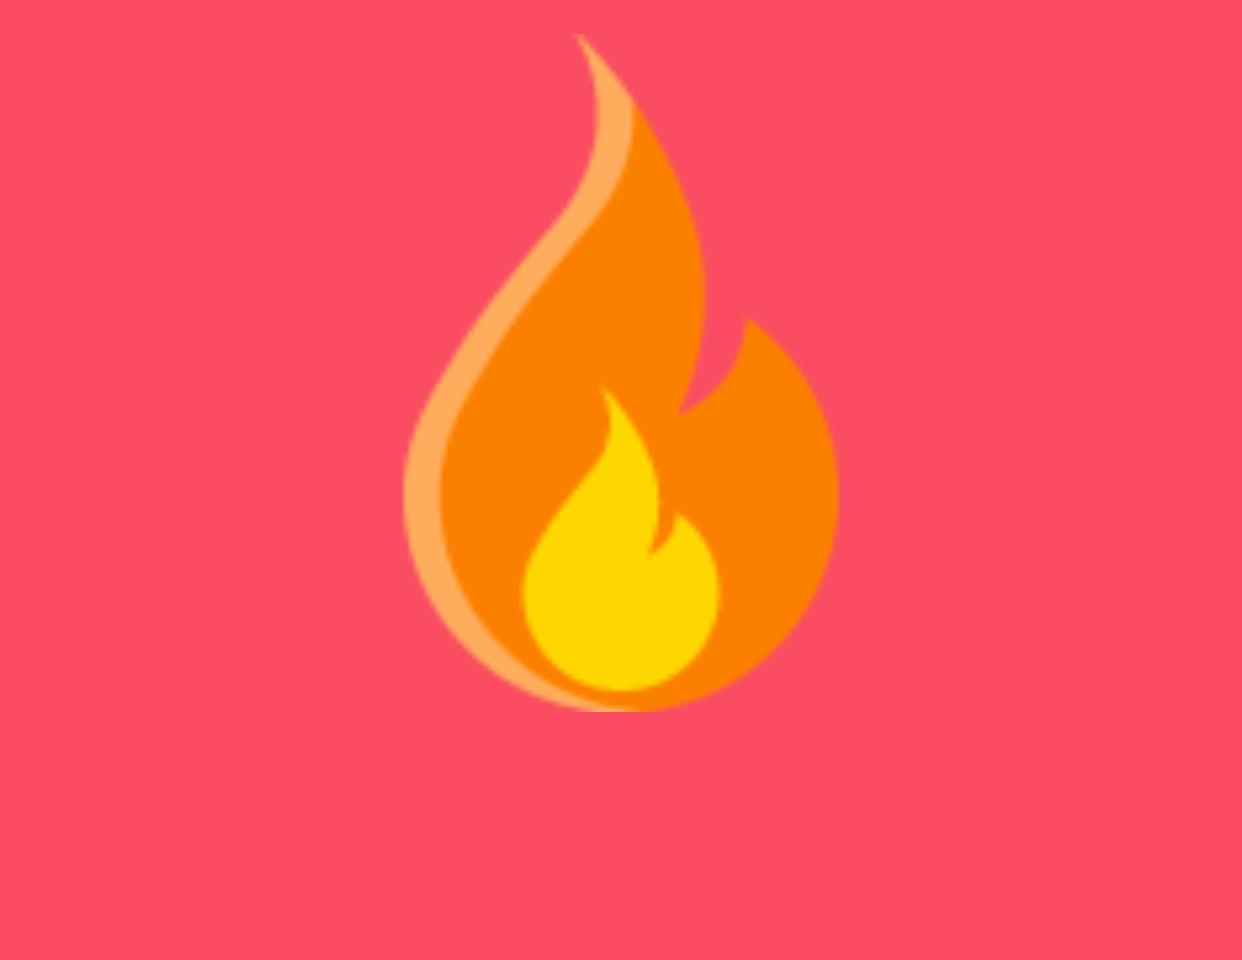 aLike tinder app like for iOS